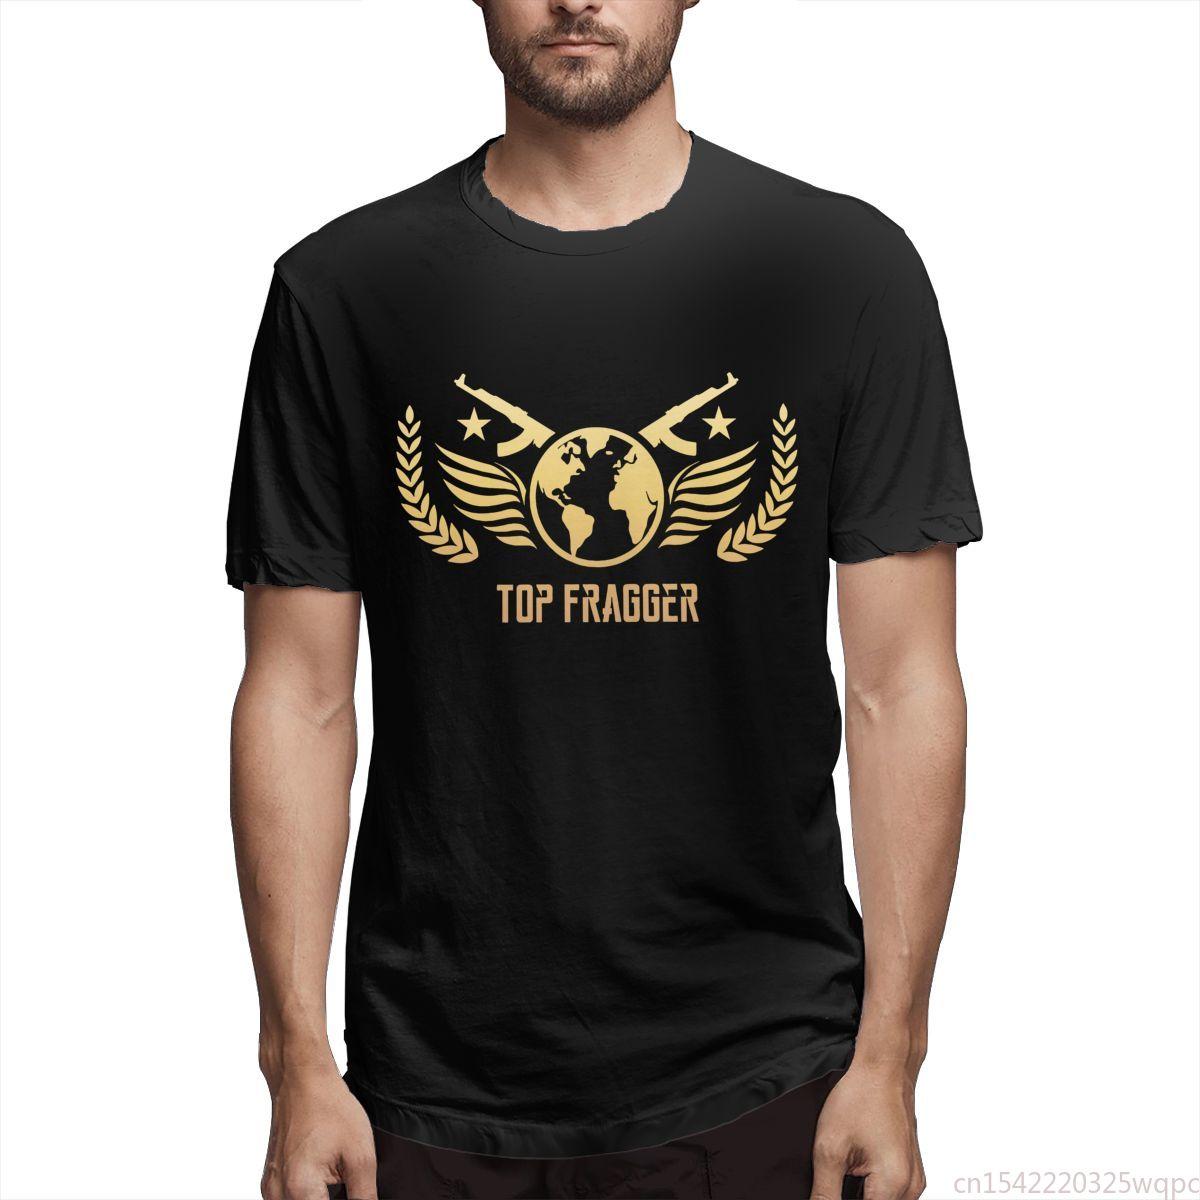 Camiseta Global de the elite, camiseta esencial de imitación de algodón